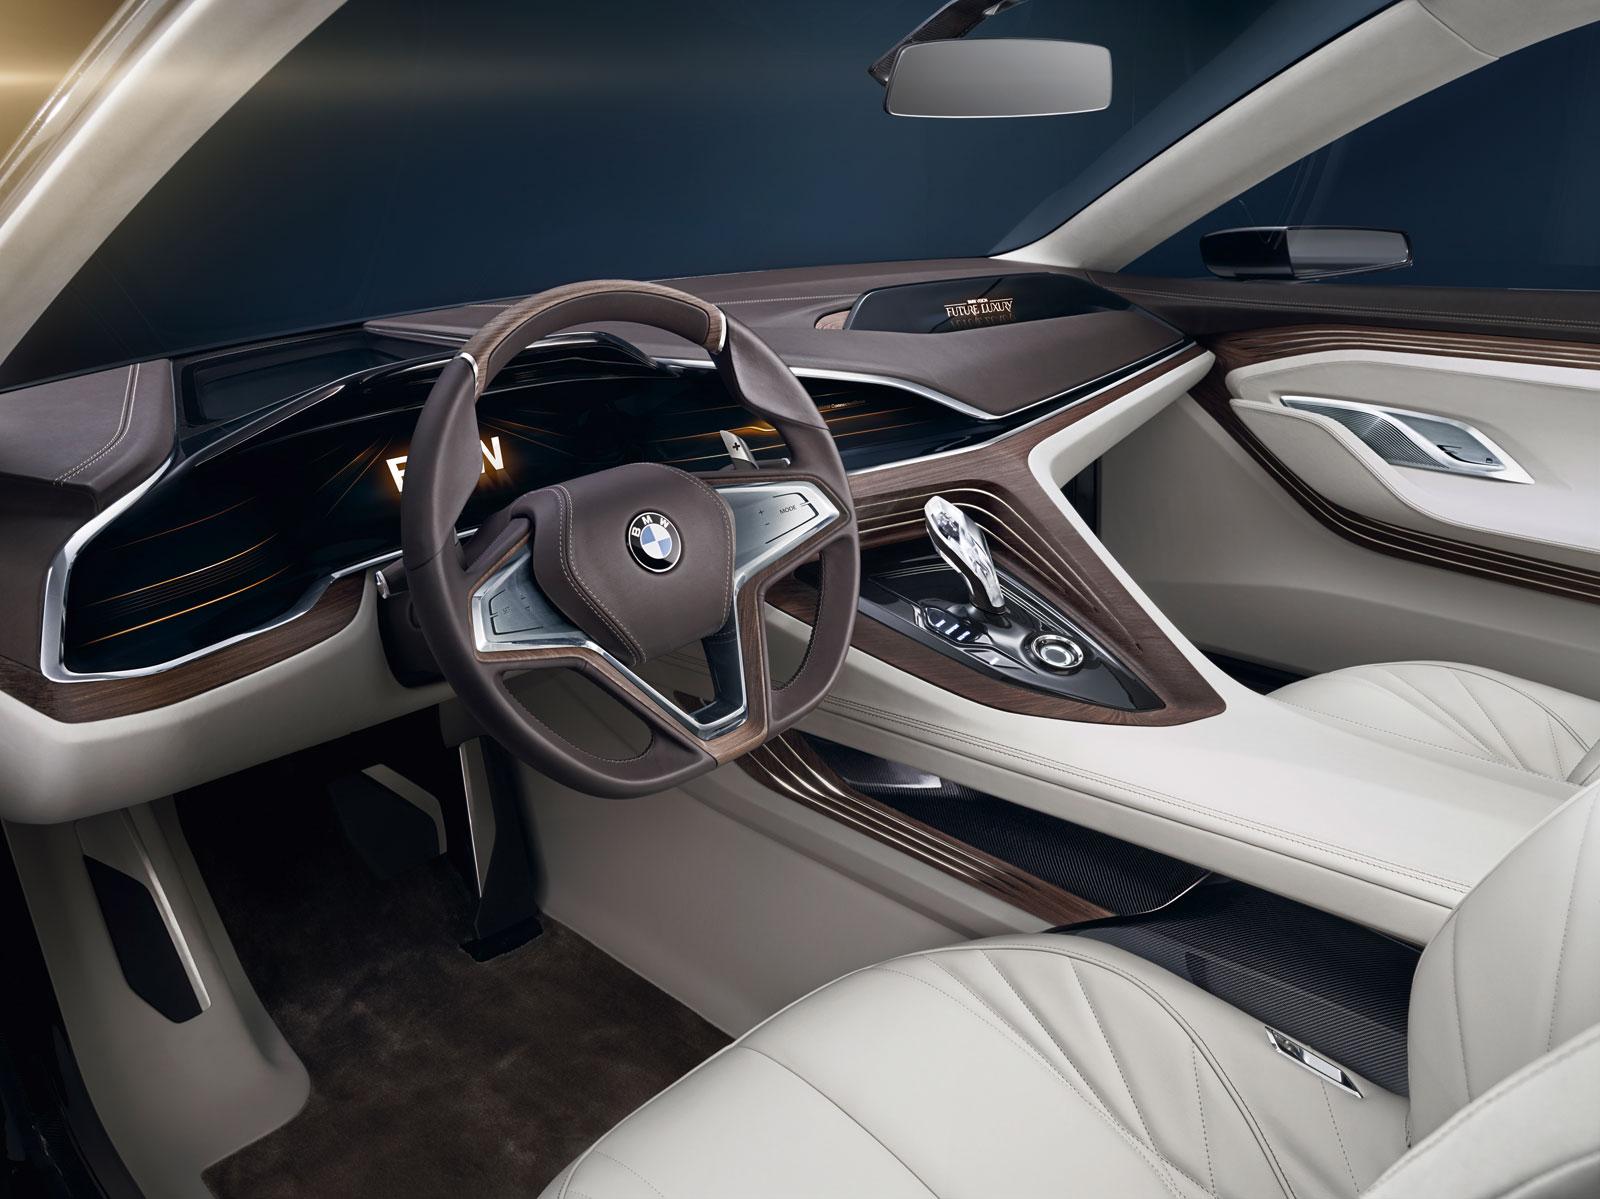 bmw vision future luxury concept interior car body design